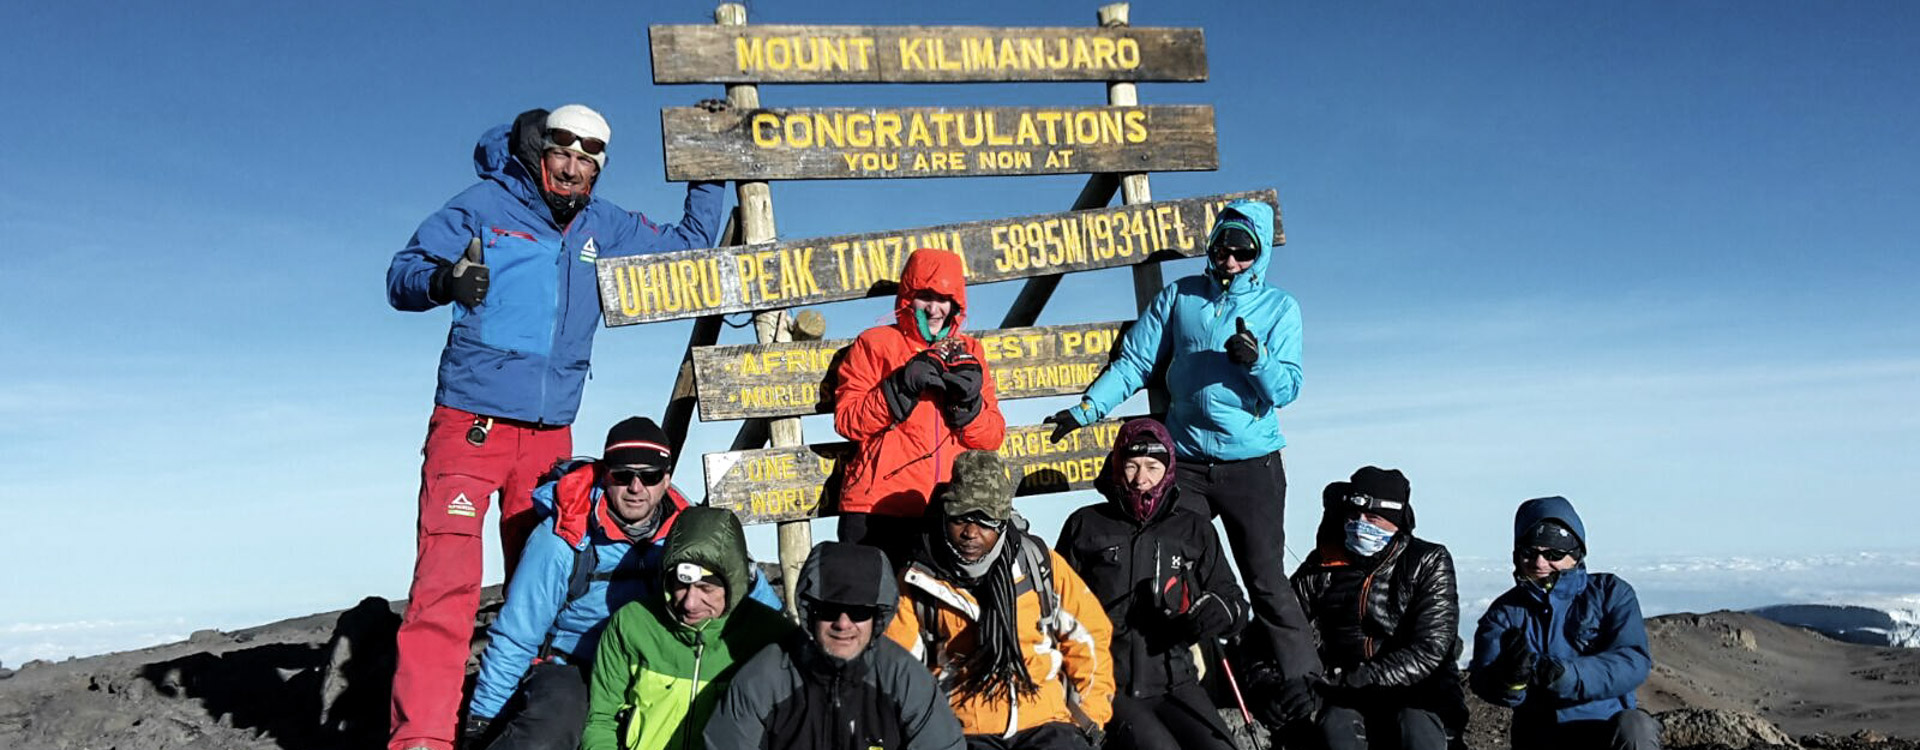 Kilimanjaro Gipfel